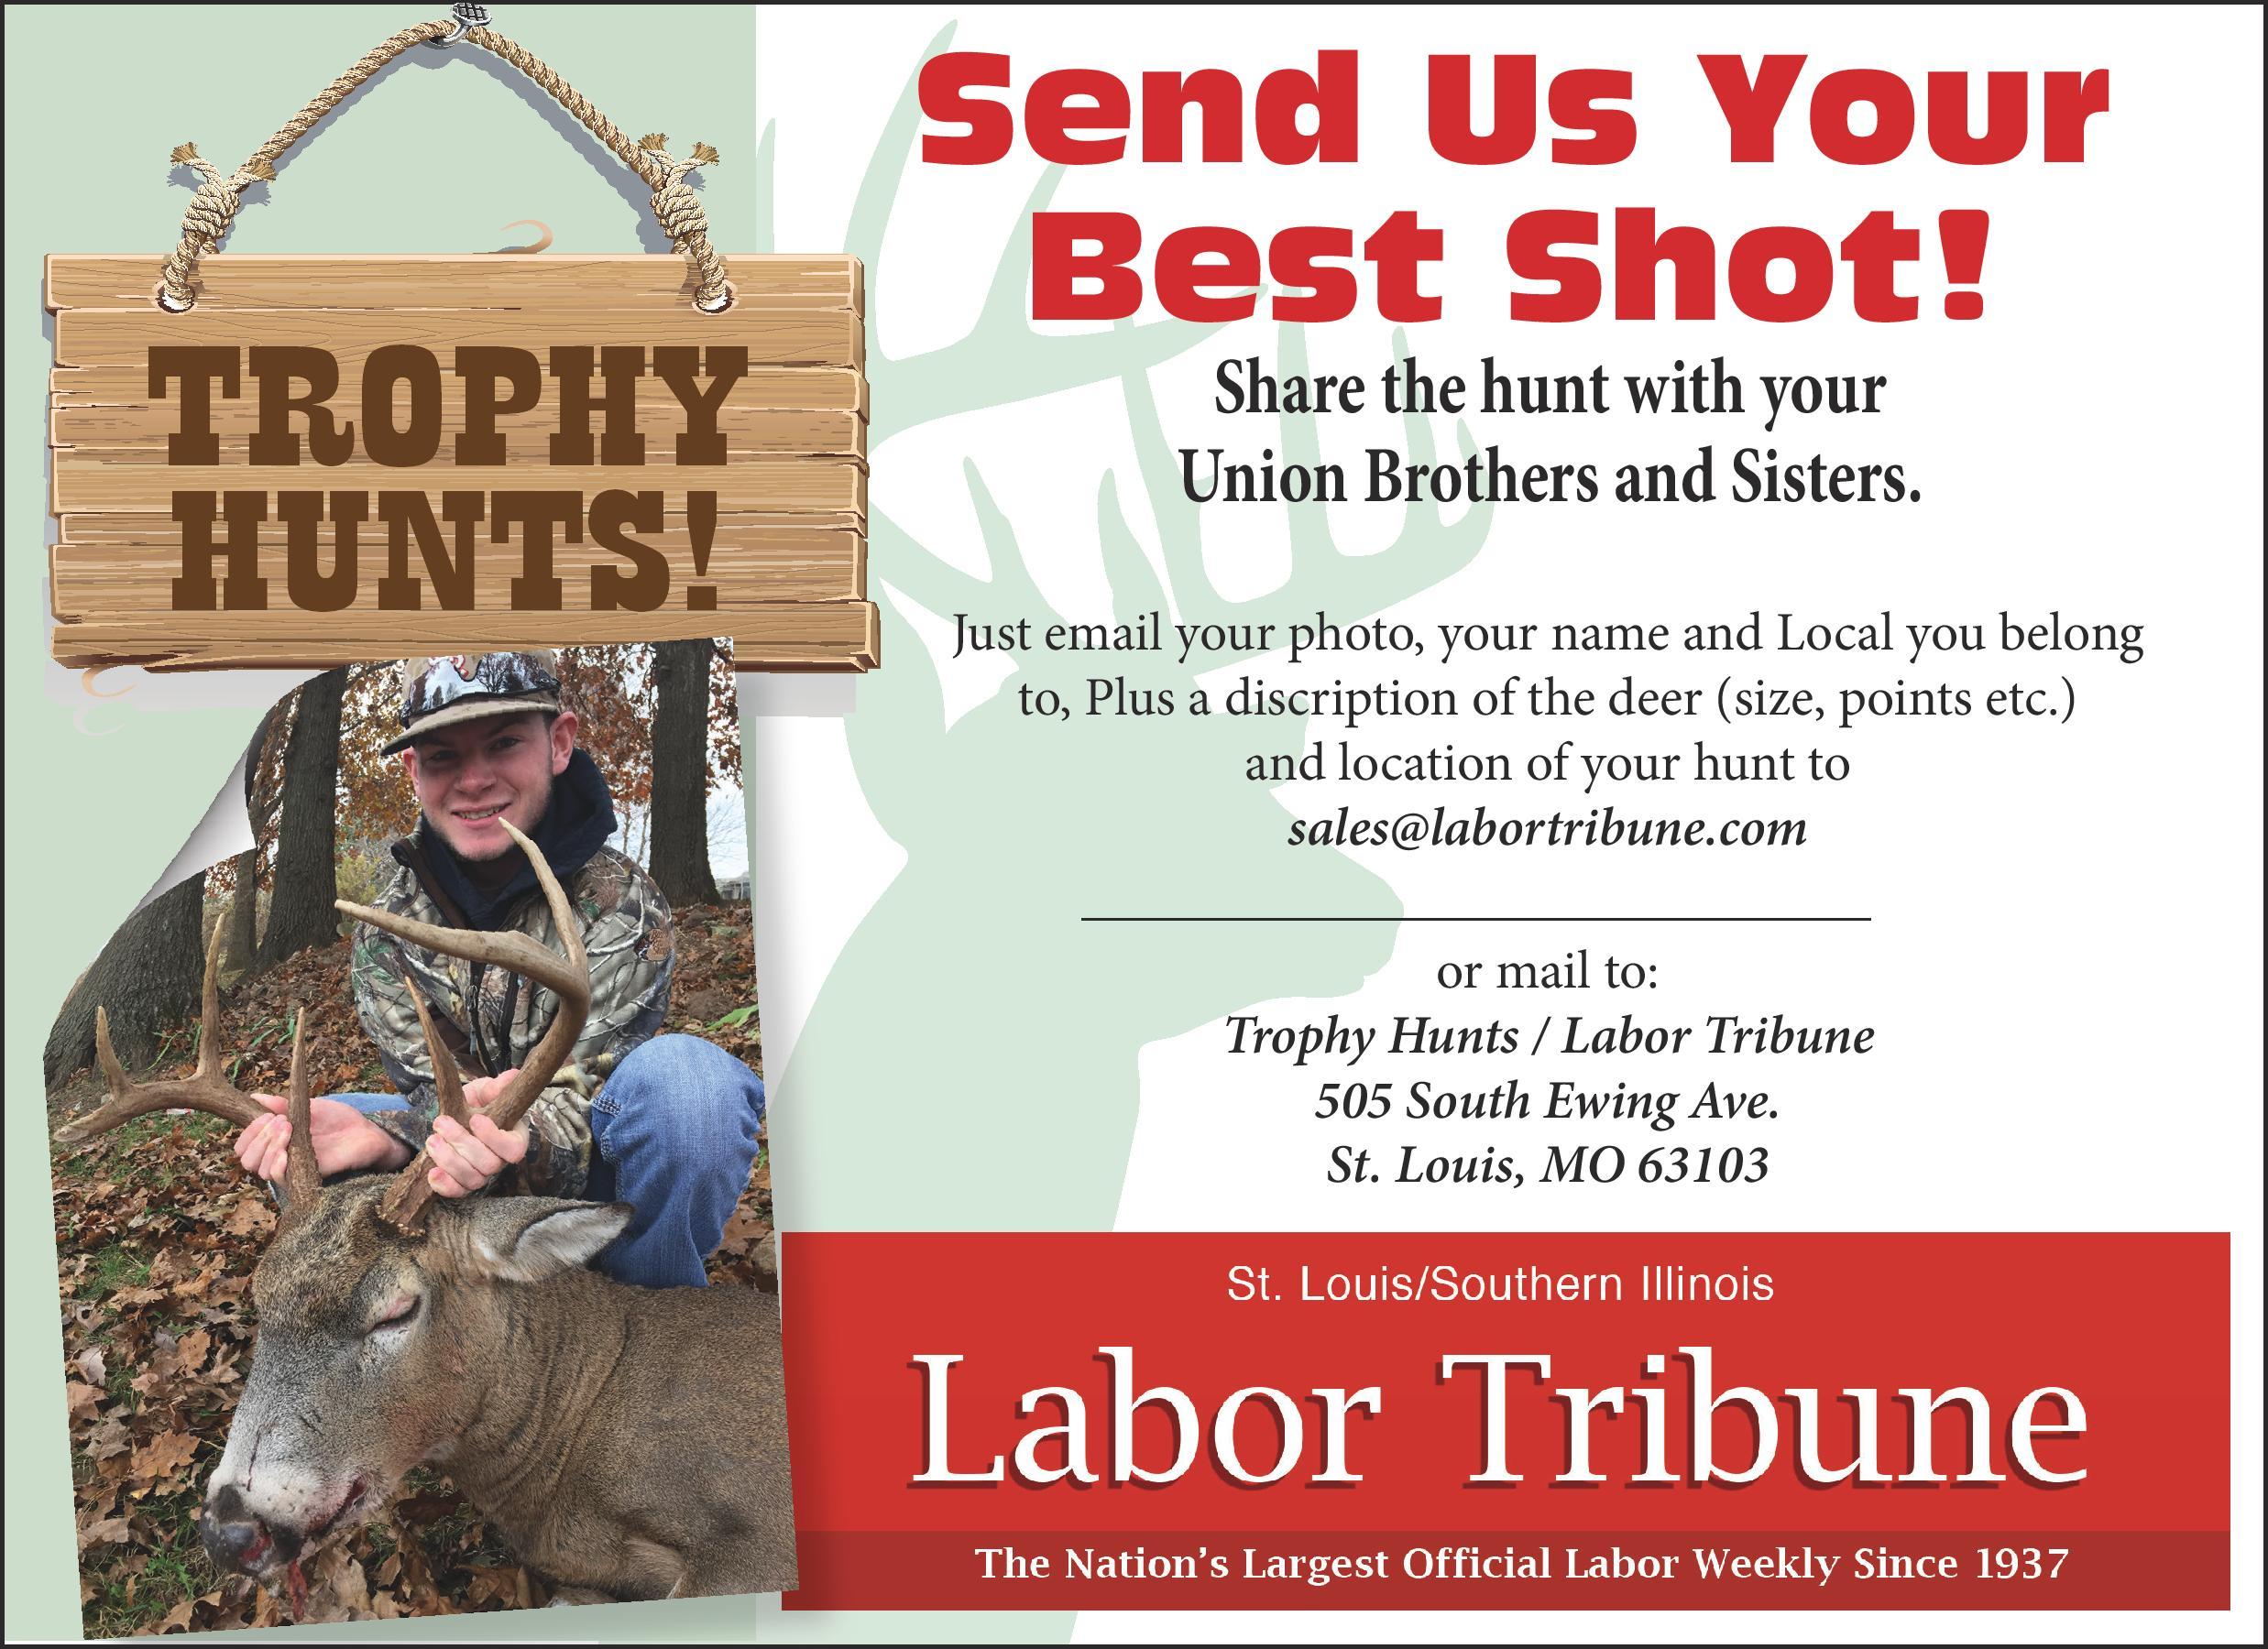 Illinois randolph county baldwin - Trophy Hunting Ad 4x6 Page 001